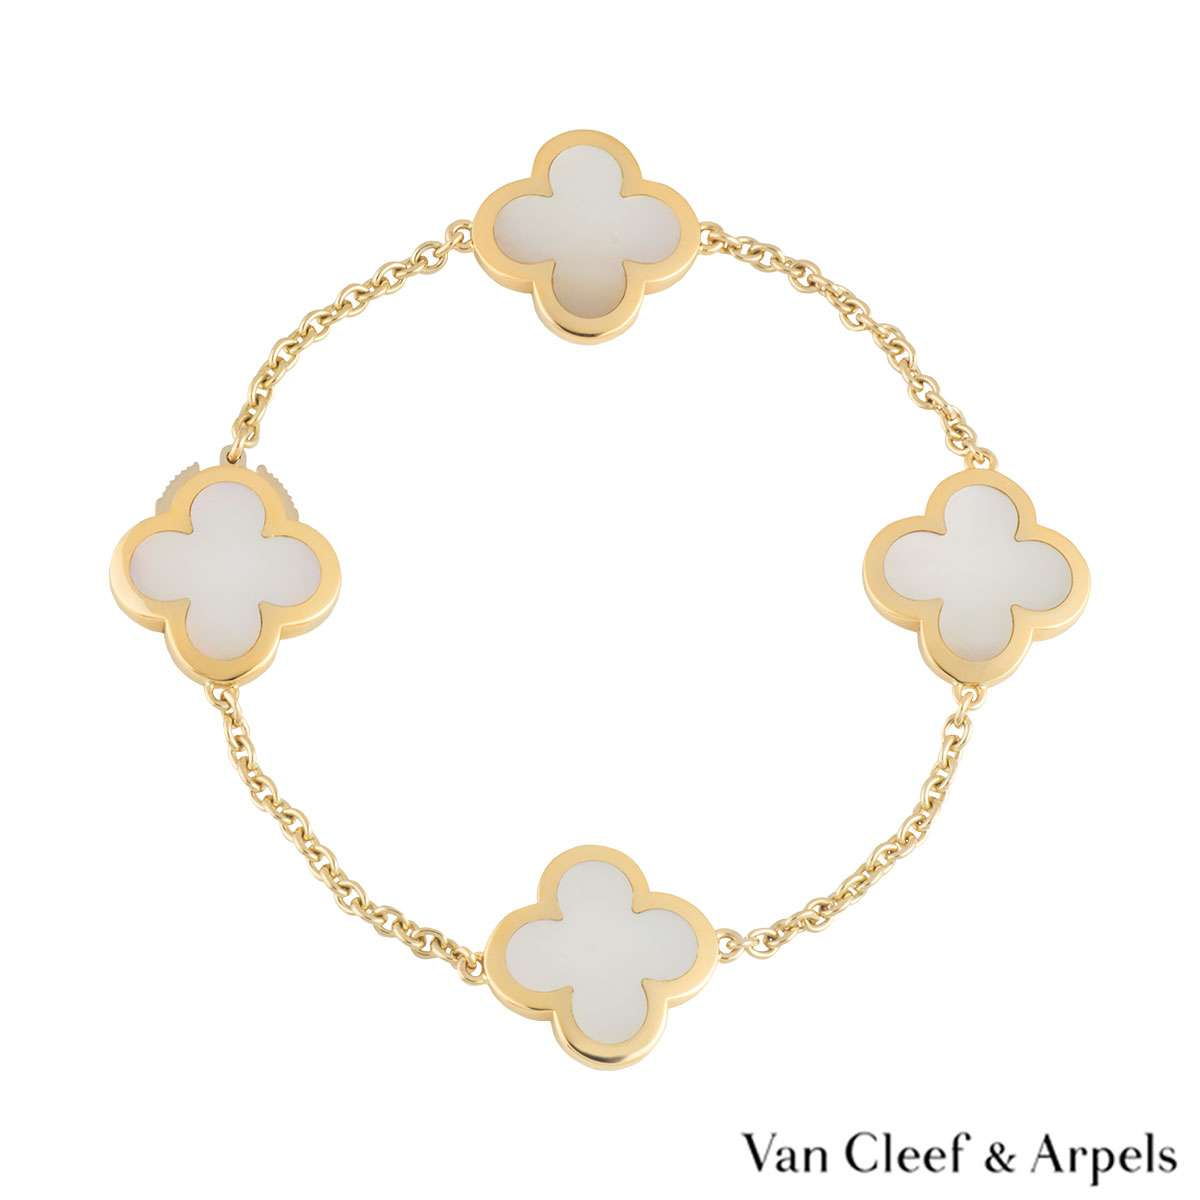 Van Cleef & Arpels Yellow Gold Alhambra Bracelet VCARA36300